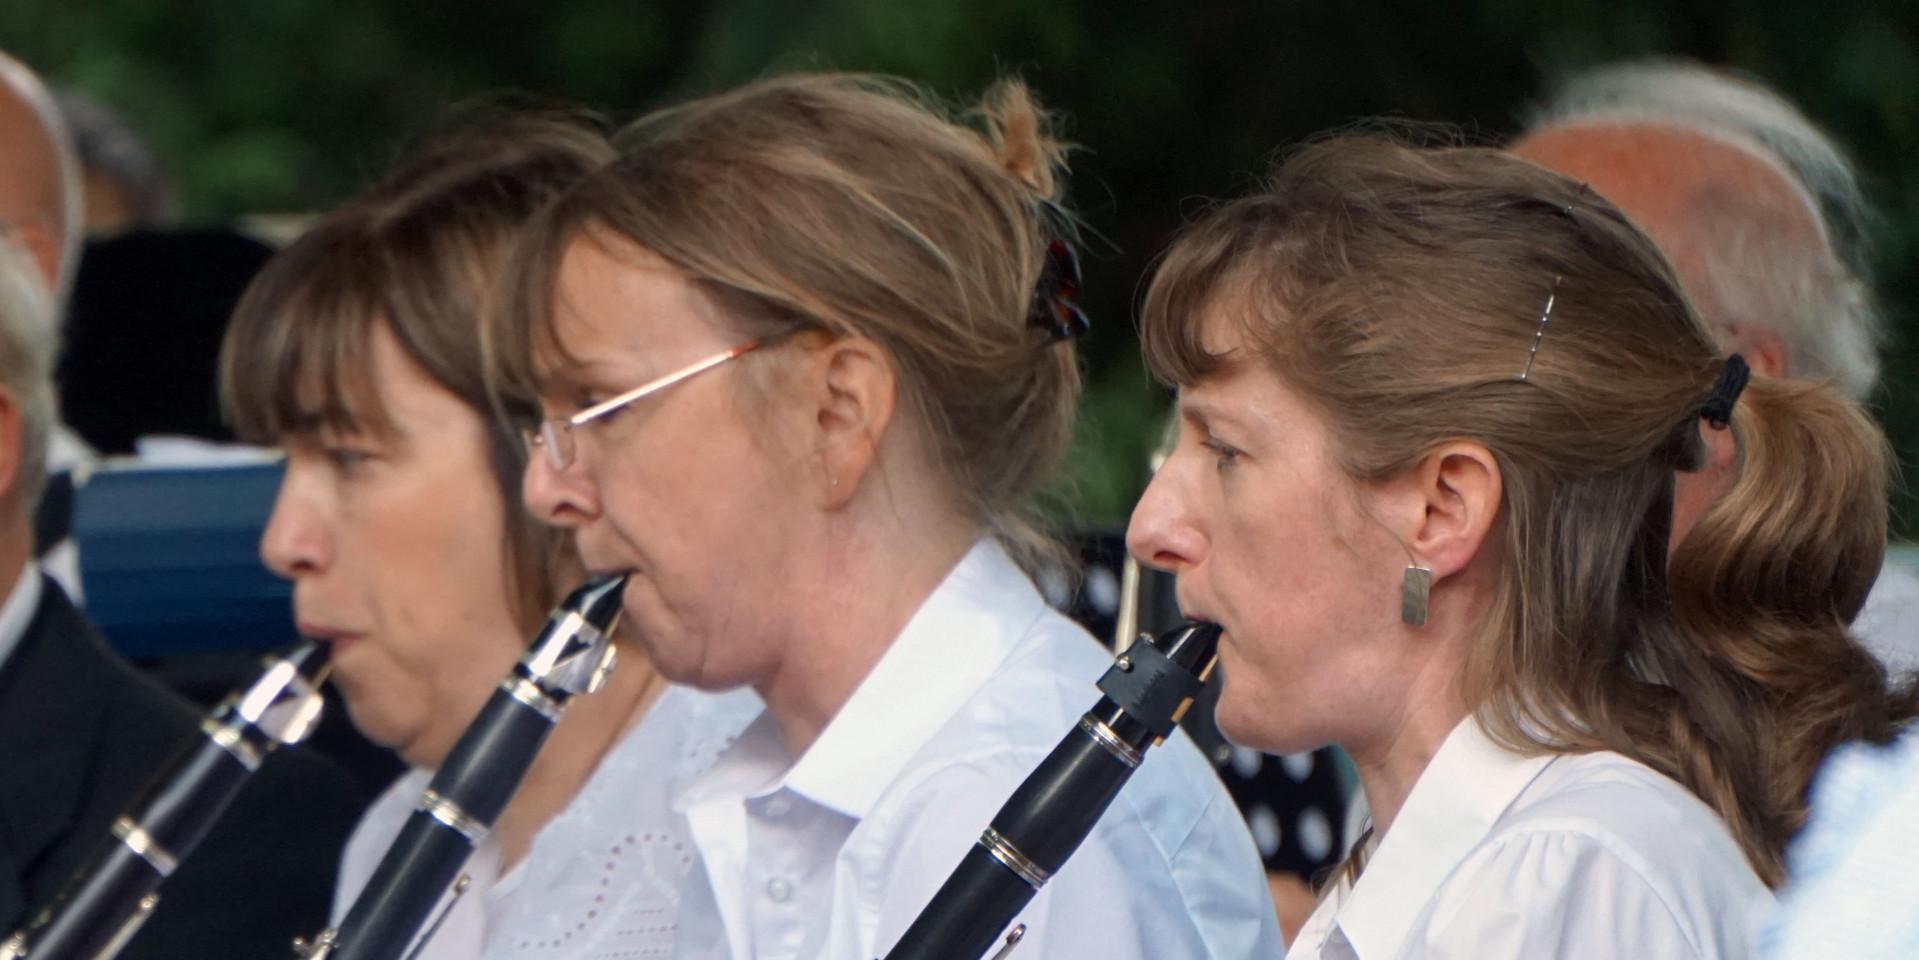 Clarinet players